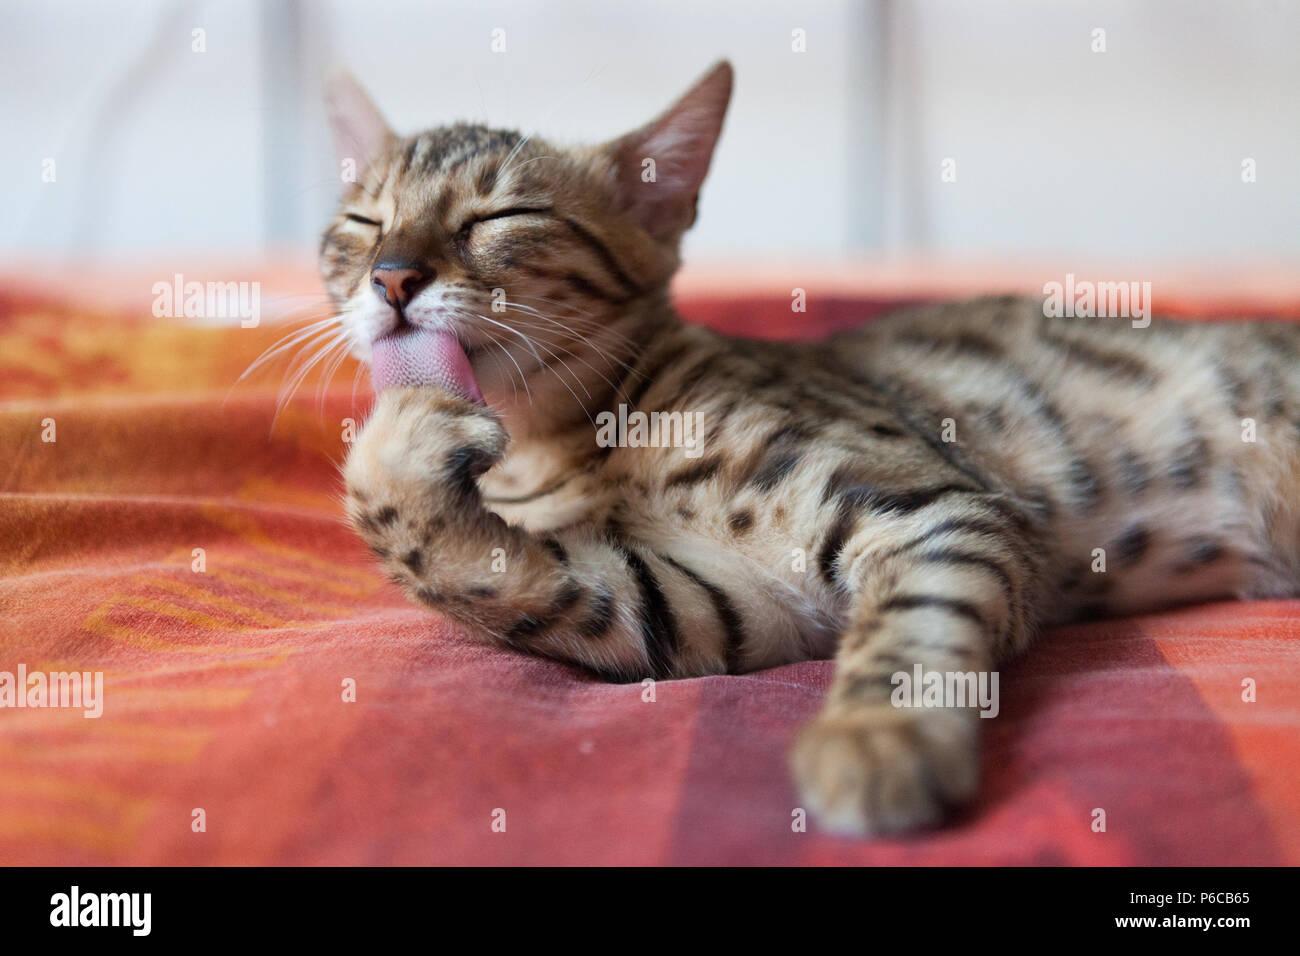 Bengal cat washing itself - Stock Image